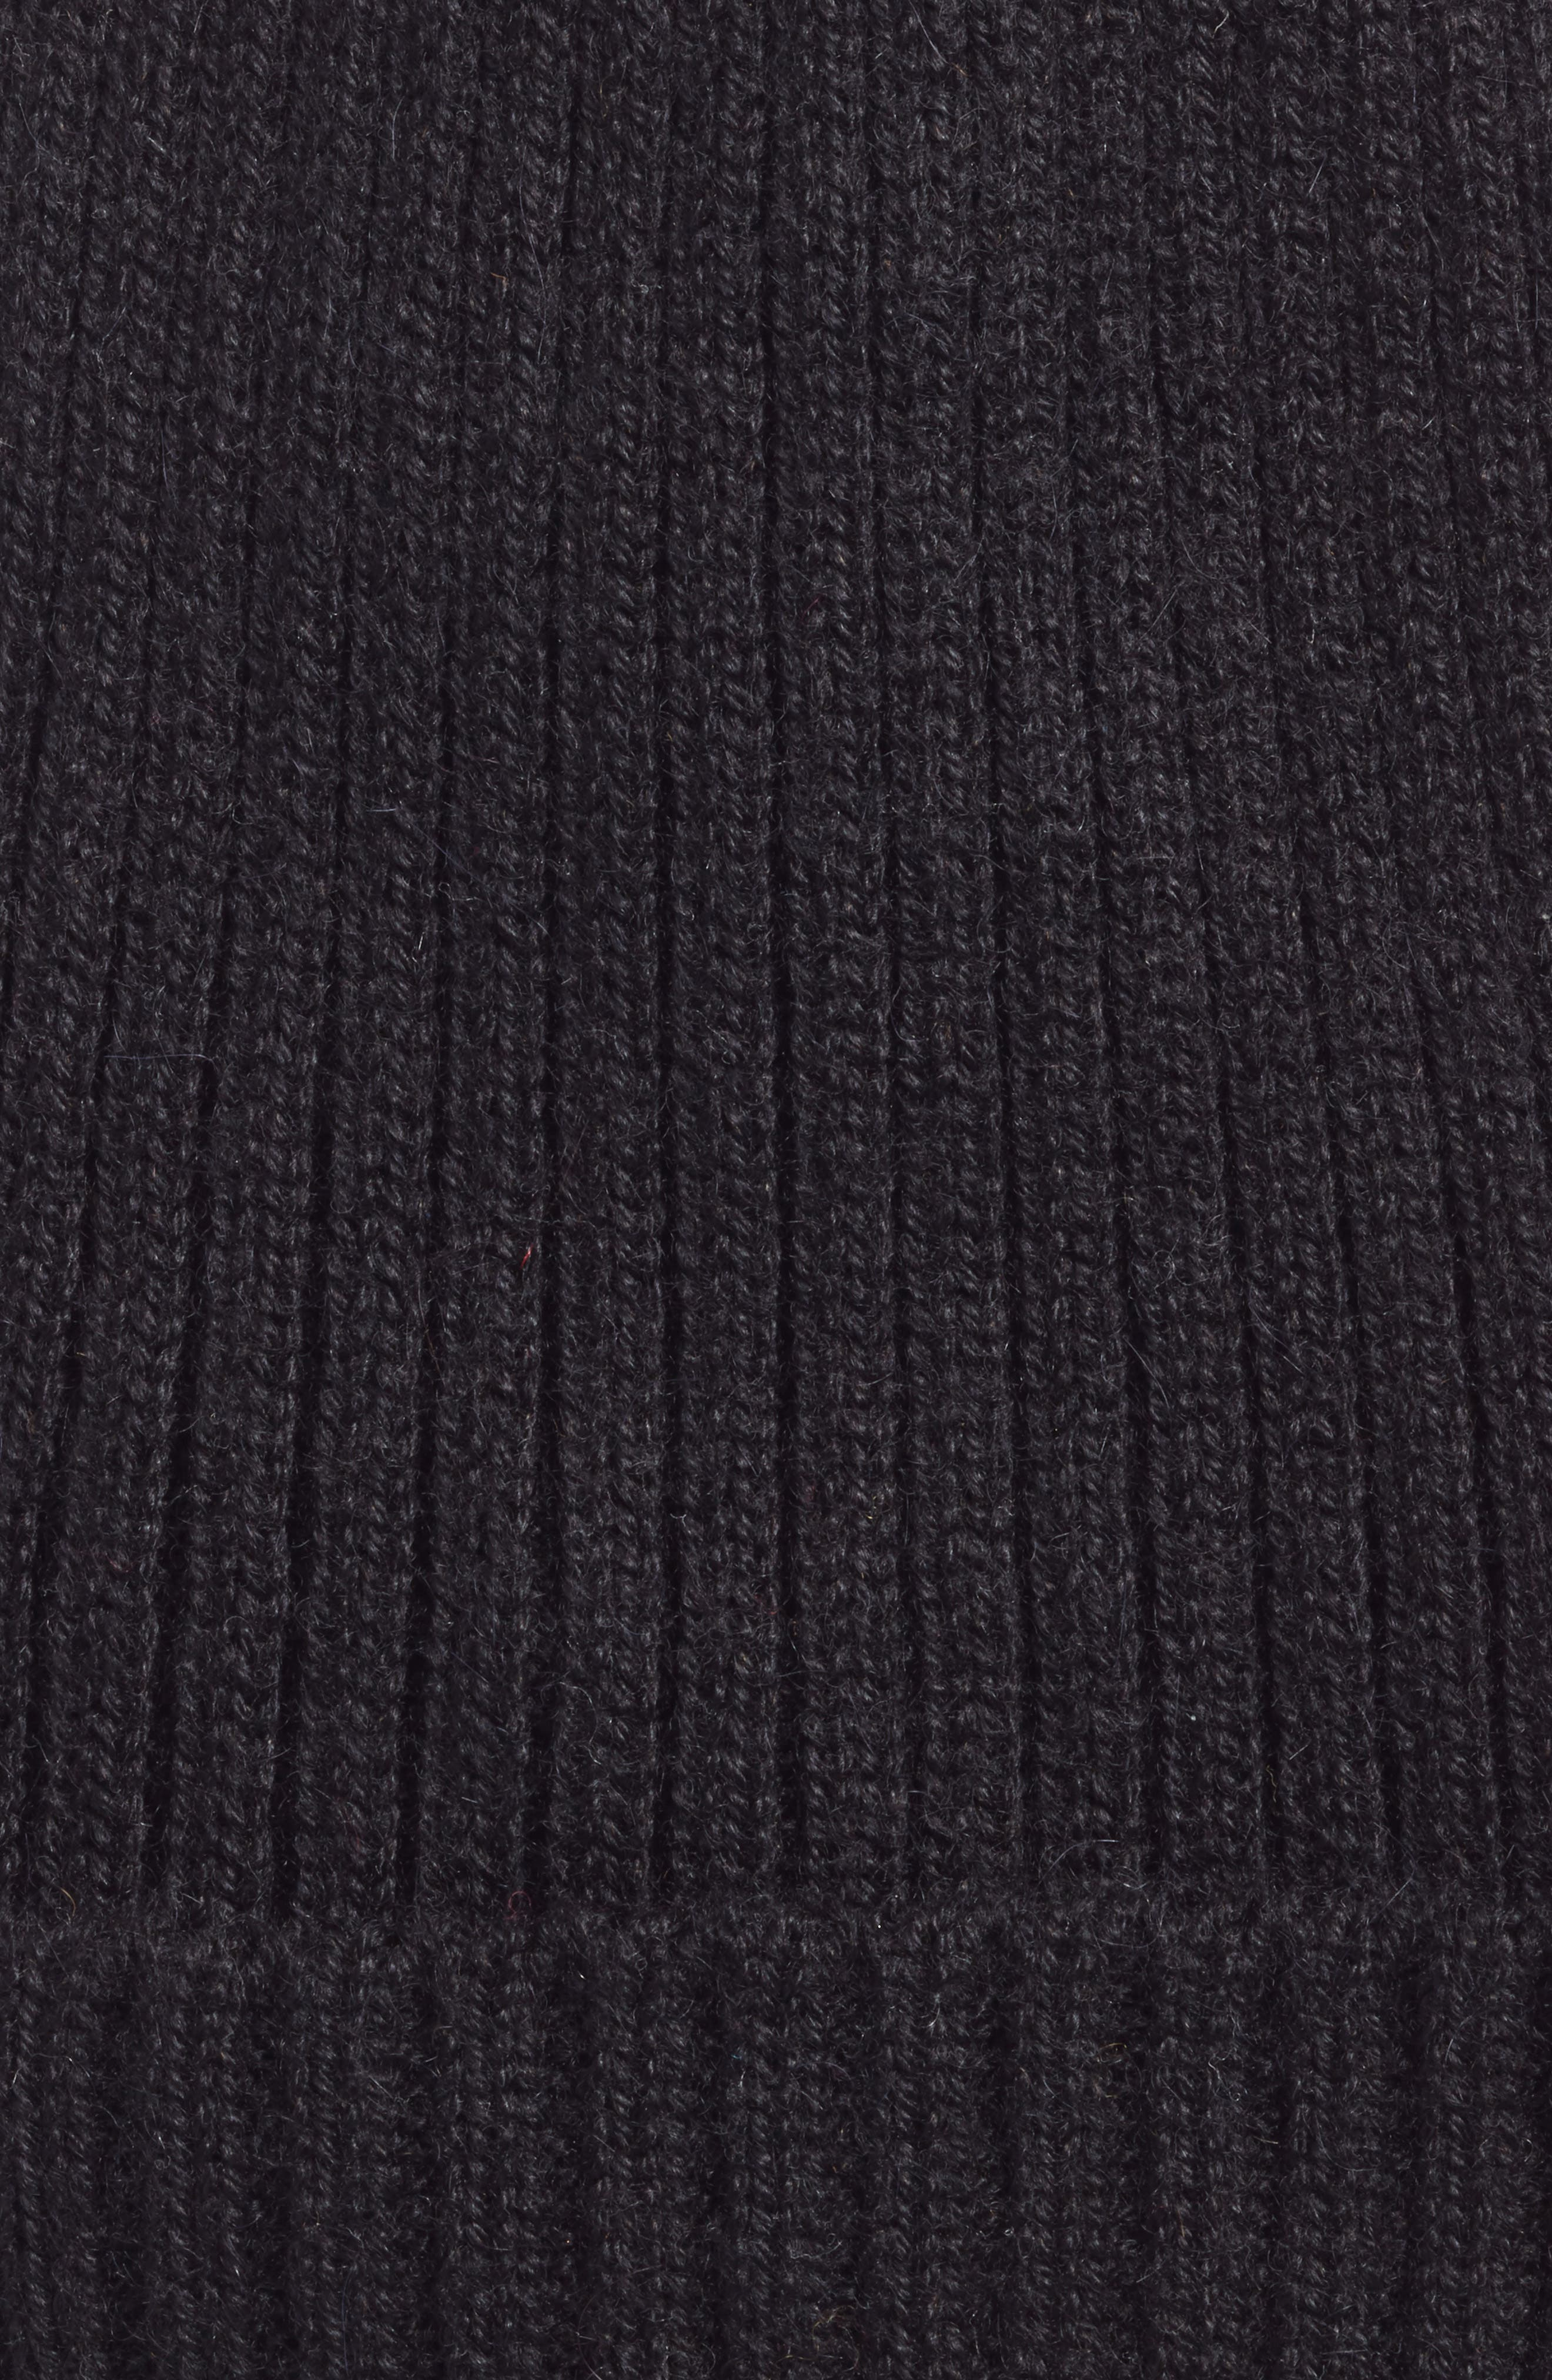 Nolita Alpaca Rib Knit Beanie,                             Alternate thumbnail 2, color,                             BLACK